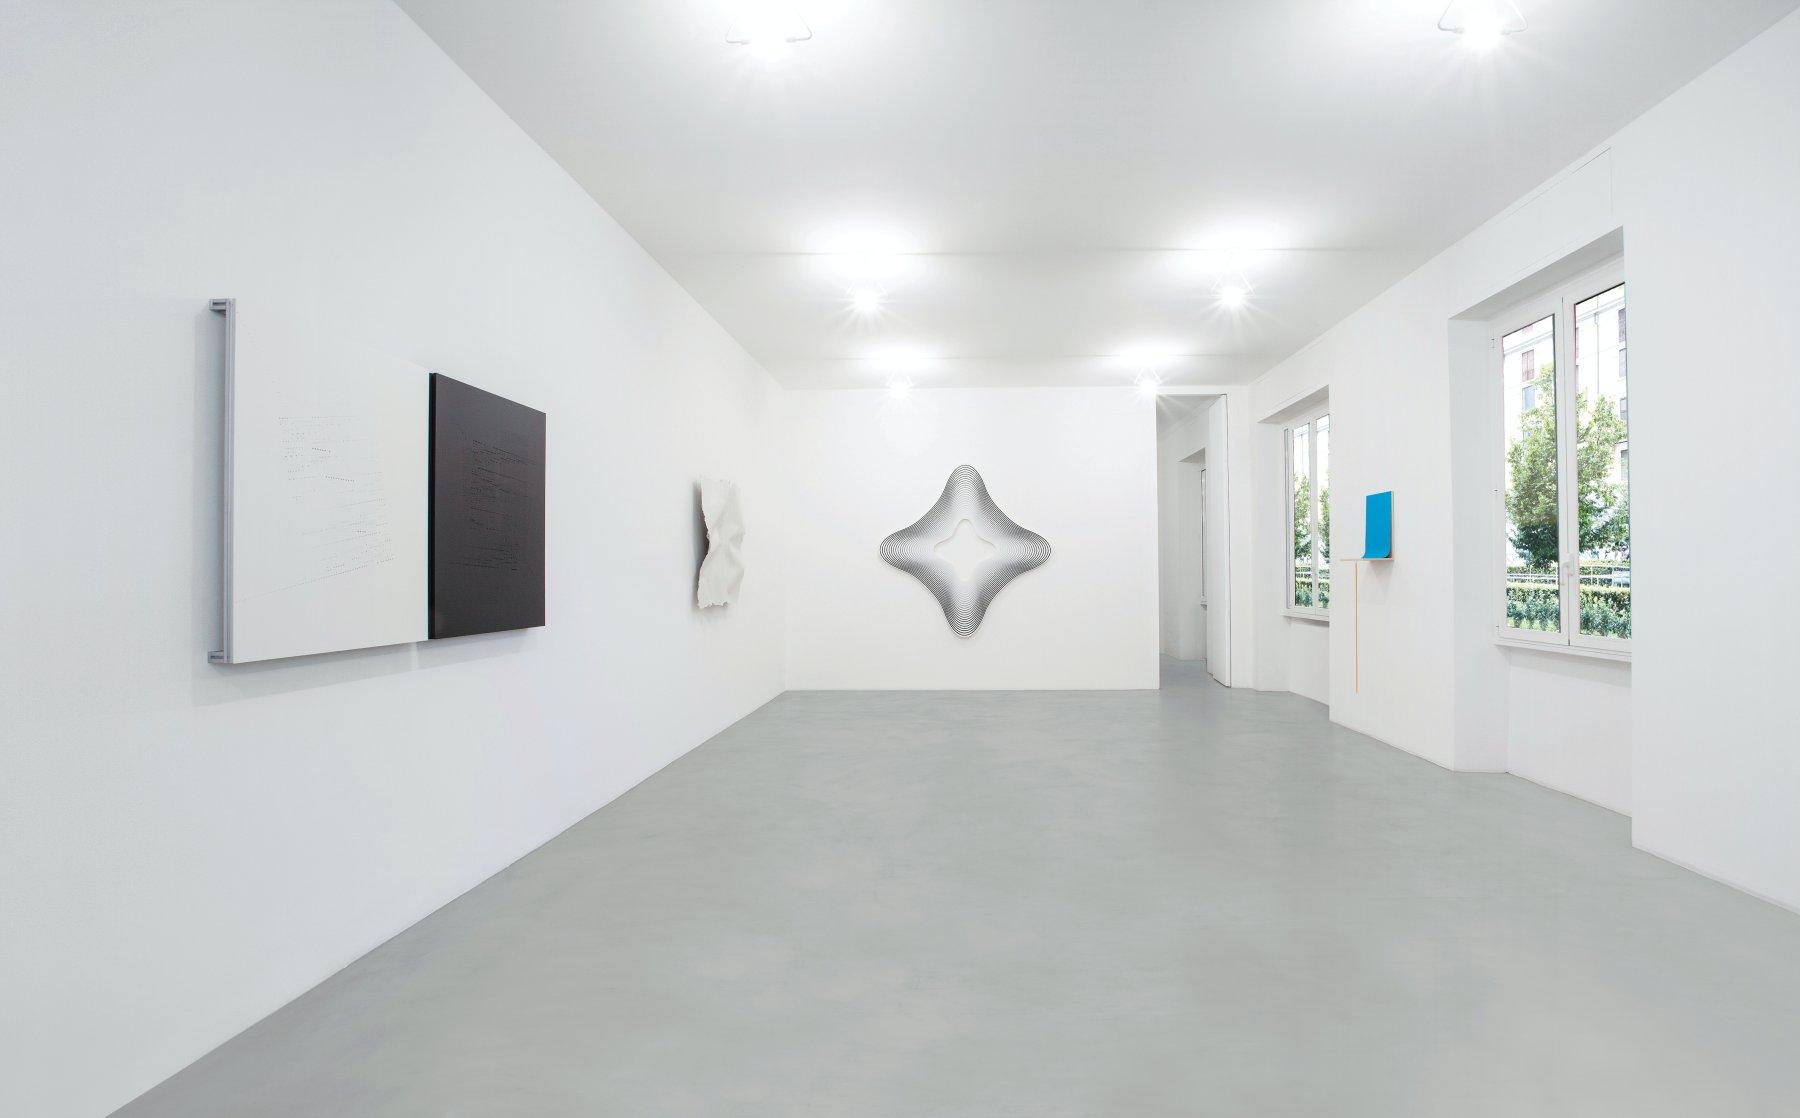 A Arte Invernizzi Sensitive spaces 1 new